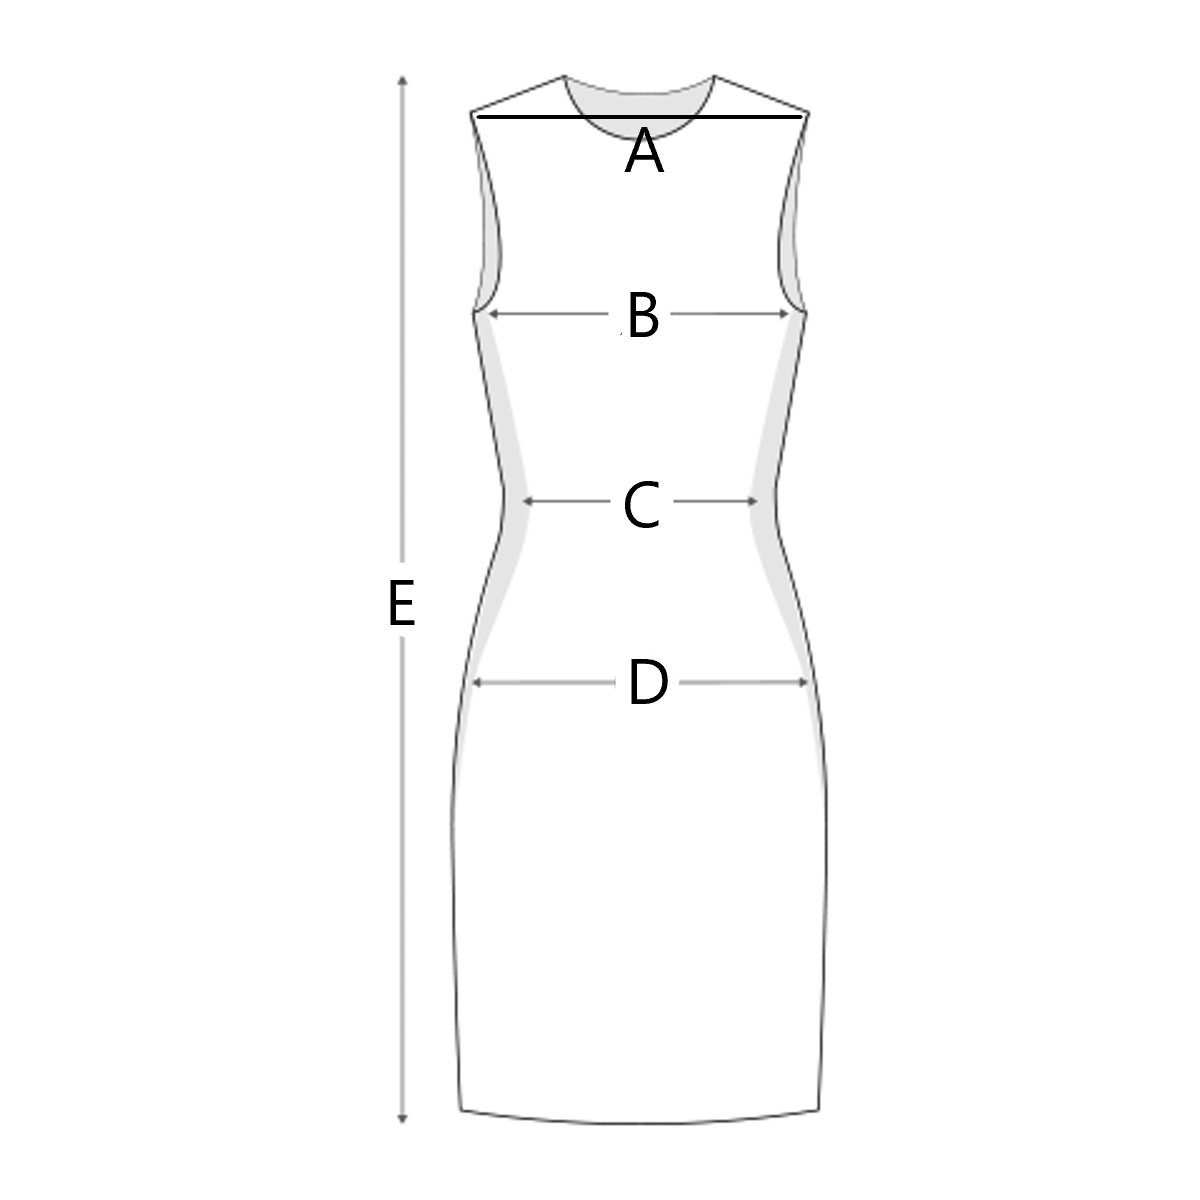 size-chart illustration